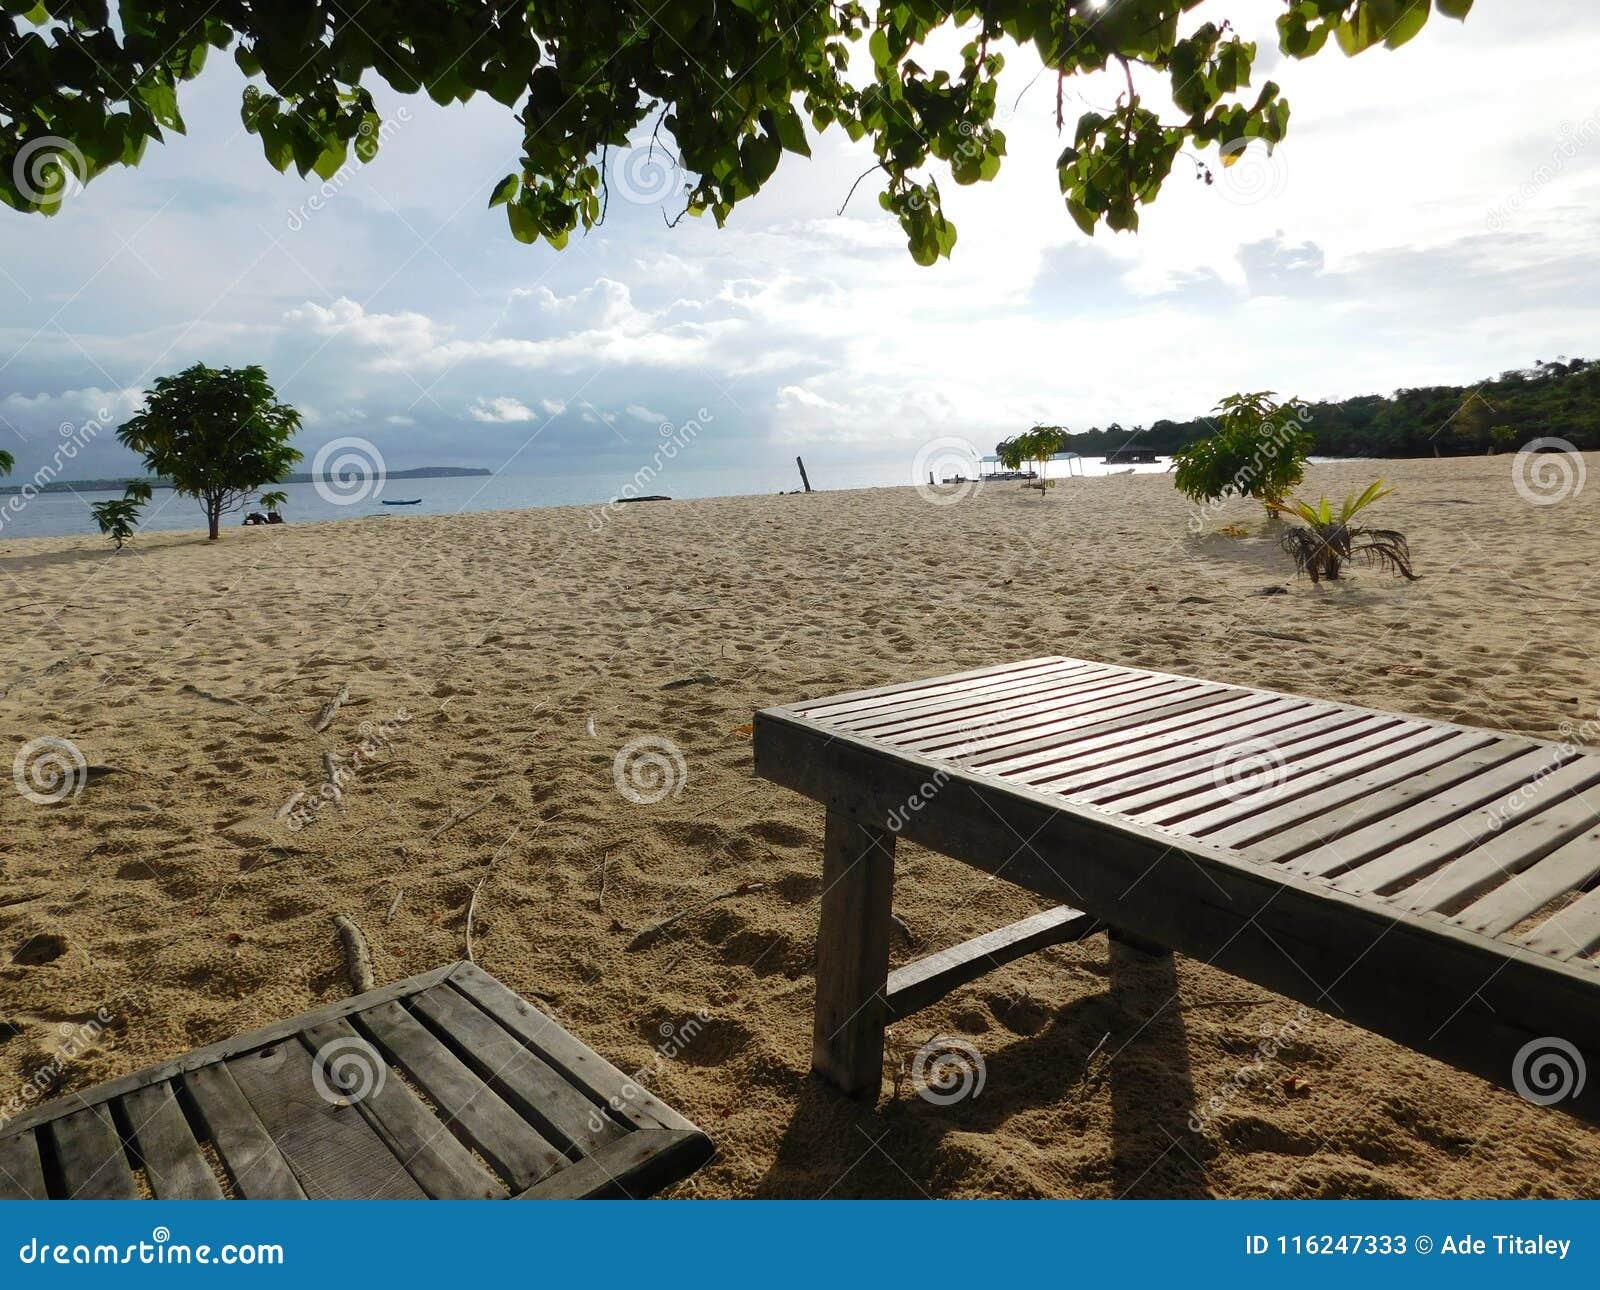 Abstrakt, plaża, natura, tekstura, piasek